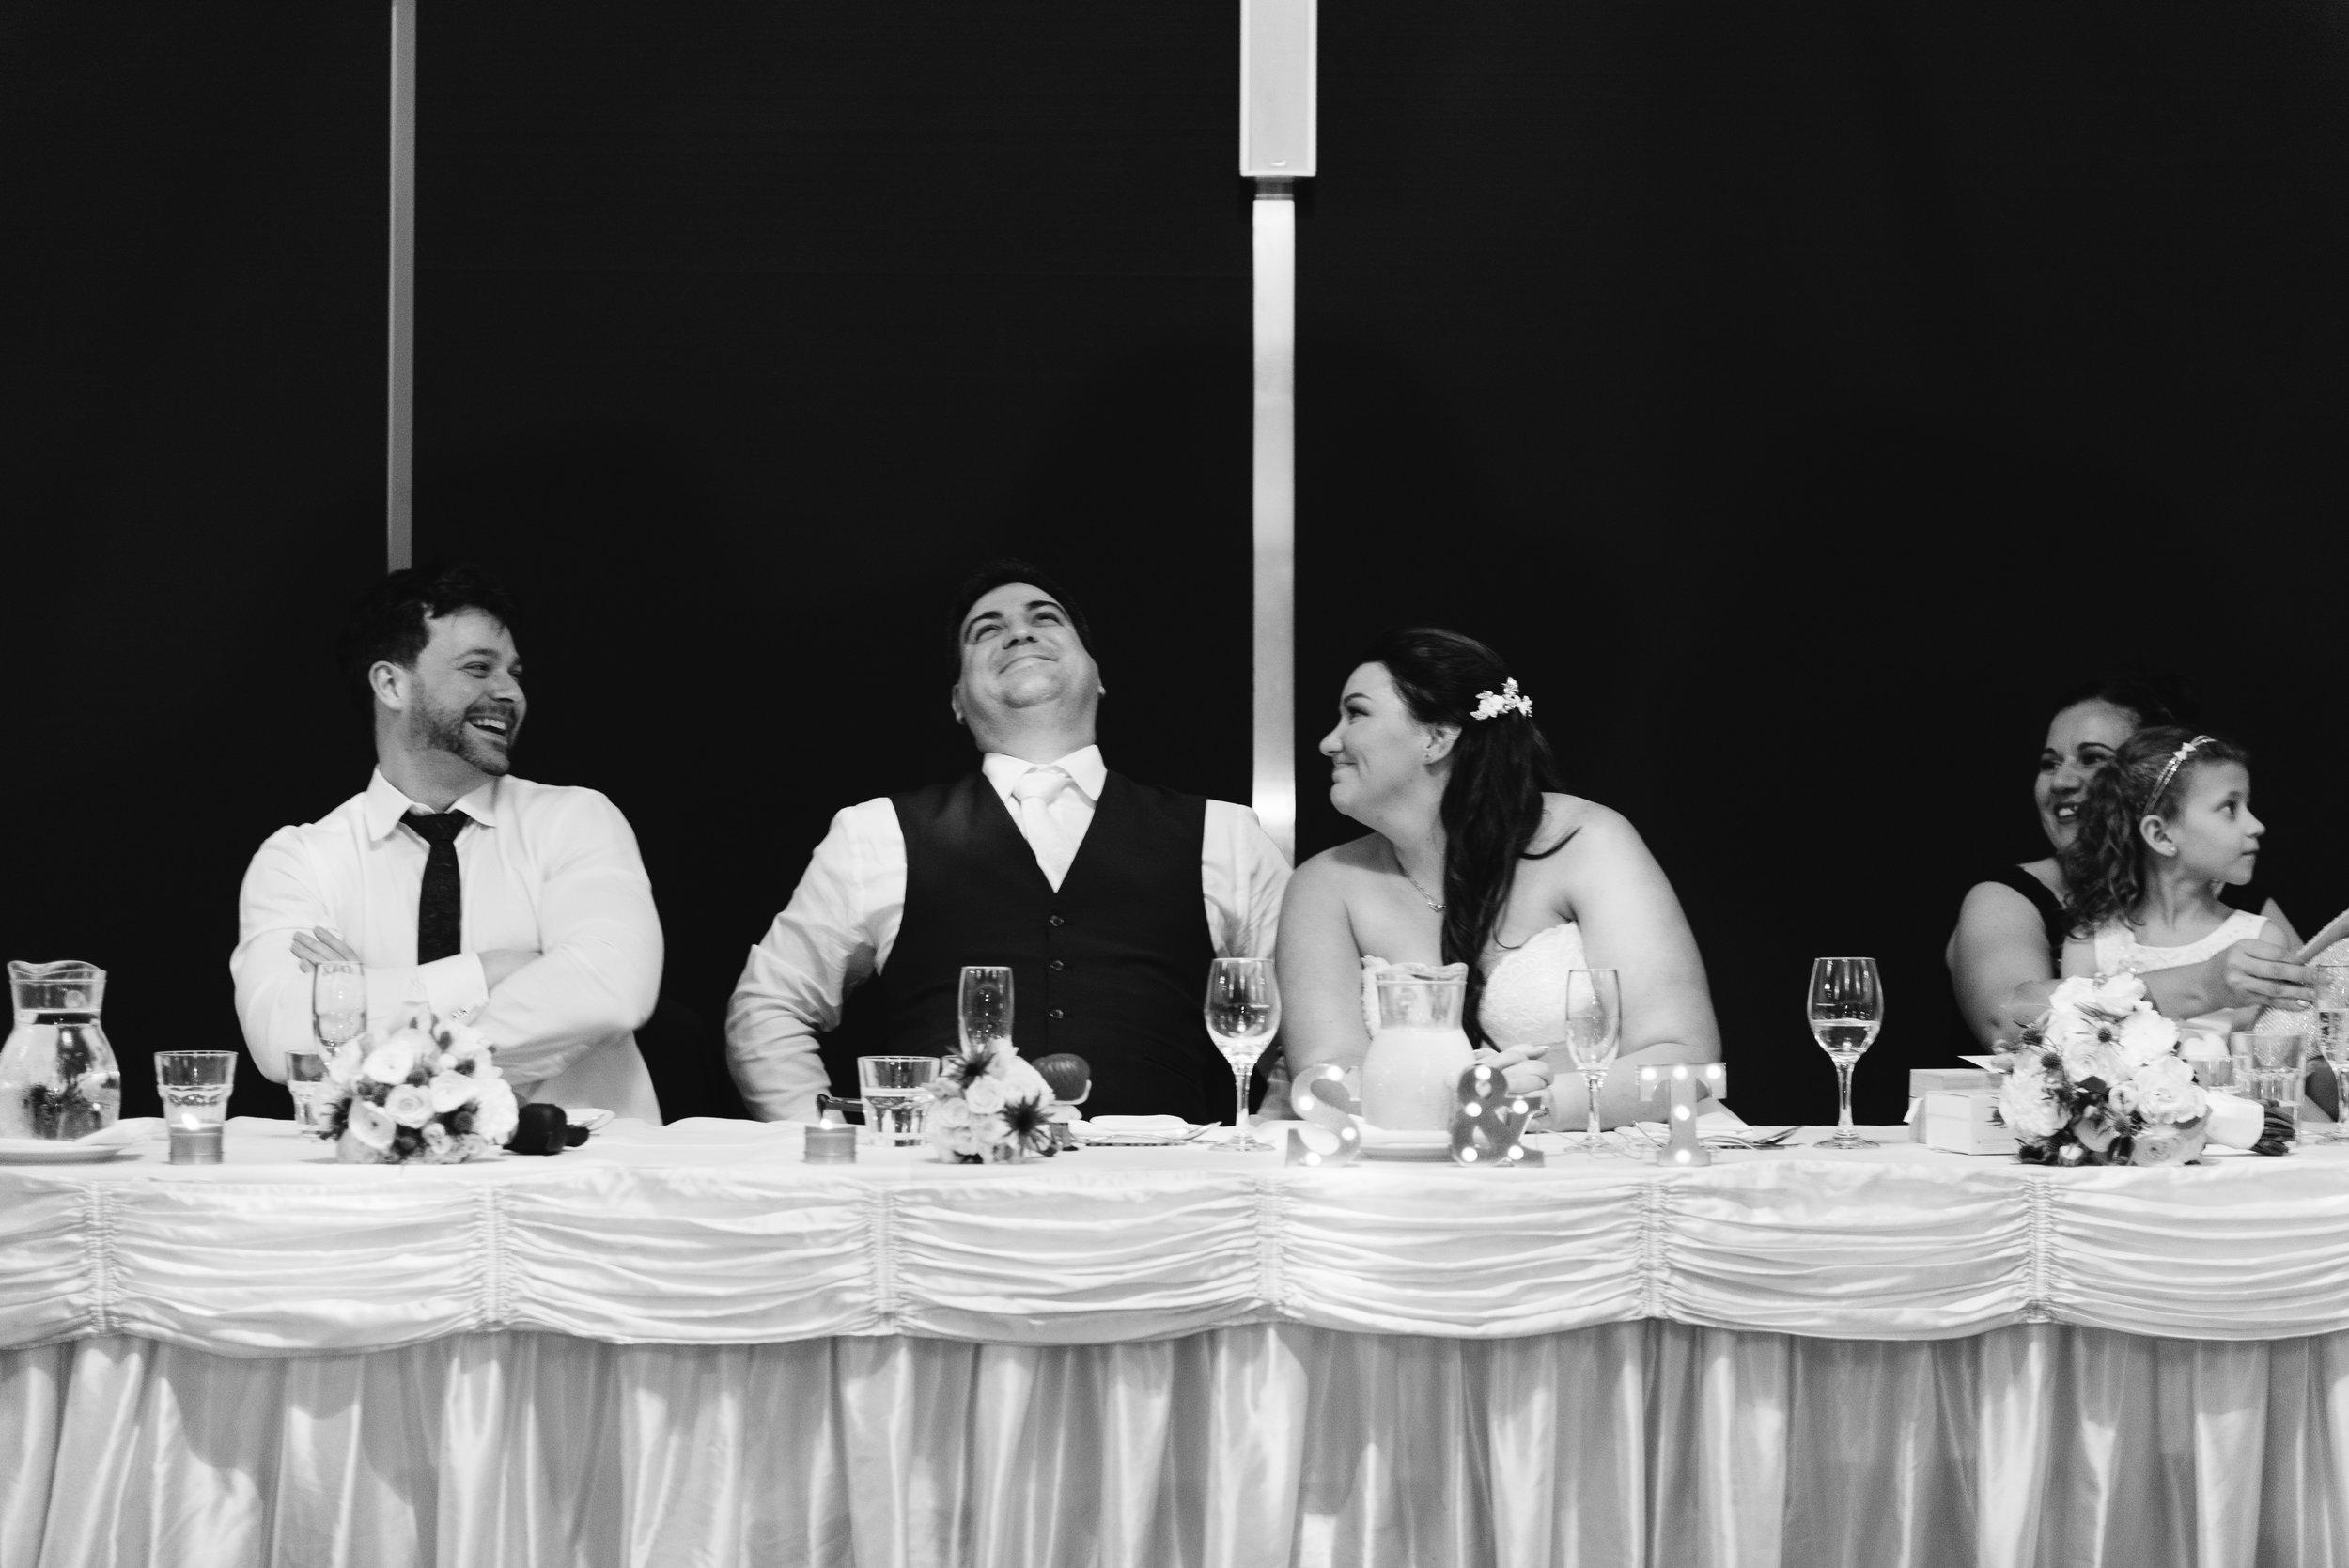 brisbane-wedding-photographer-102.jpg